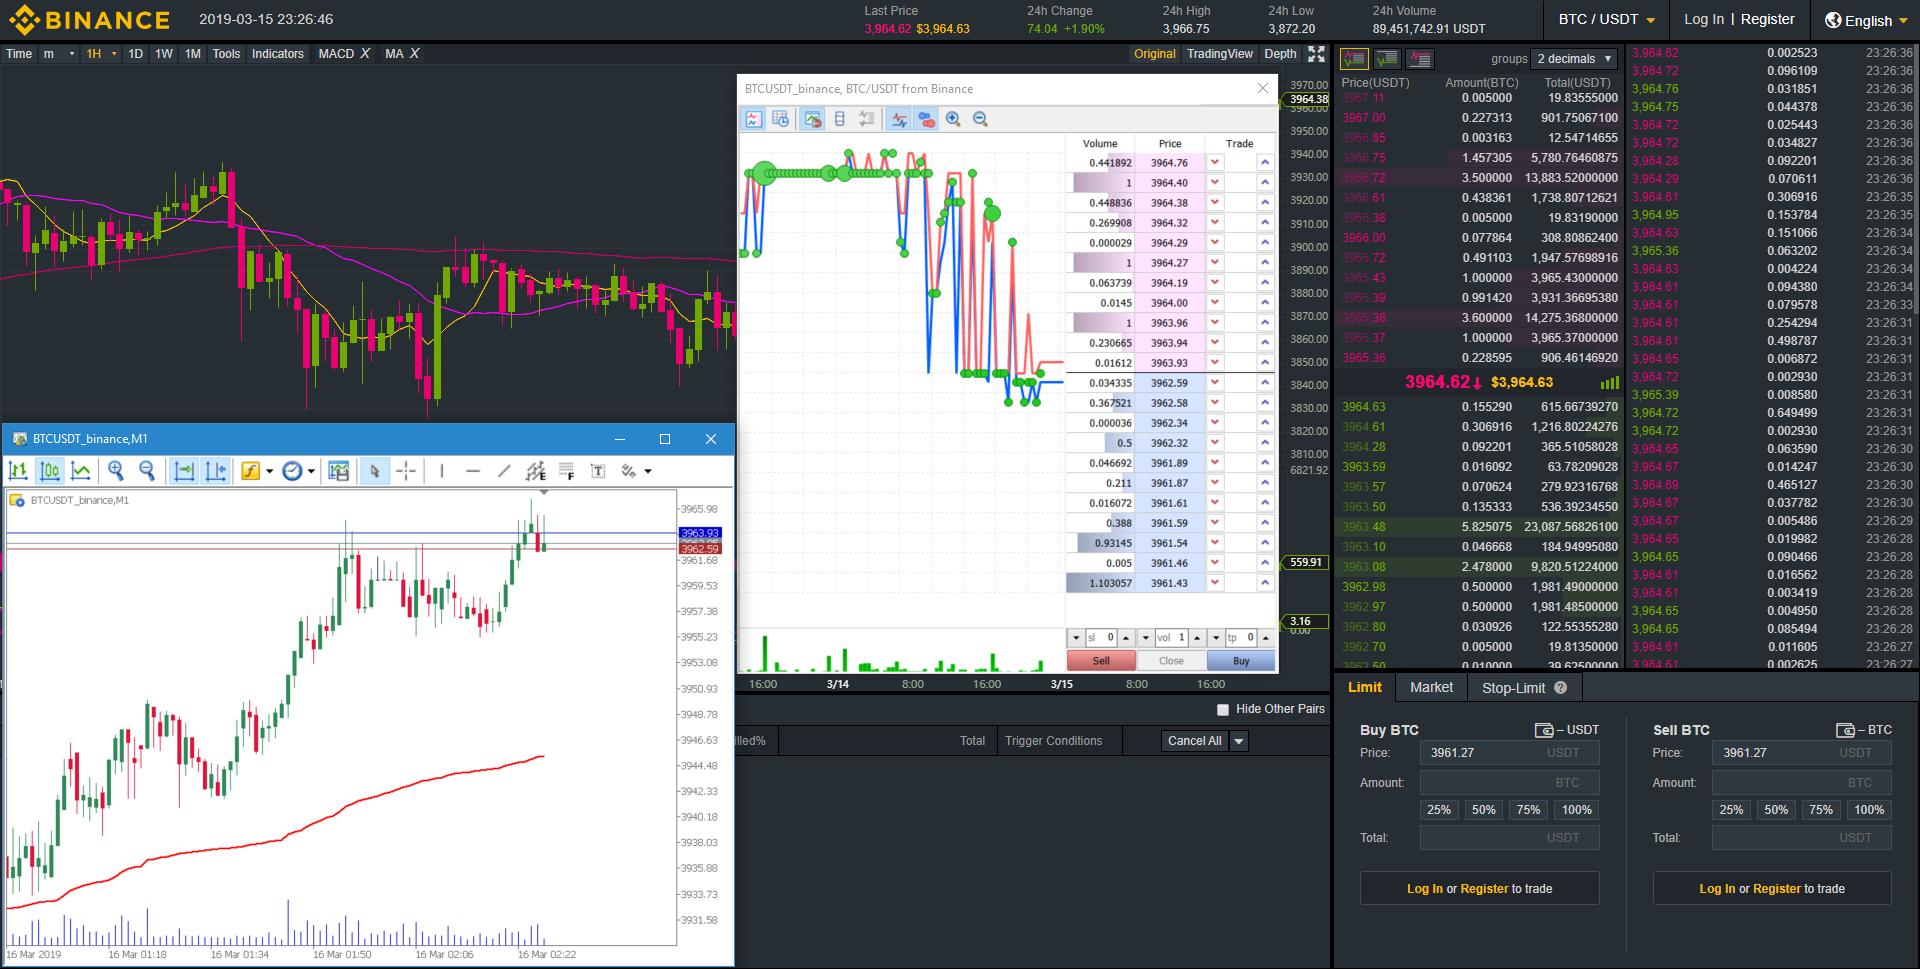 fmz - Trader's profile - MQL5 community